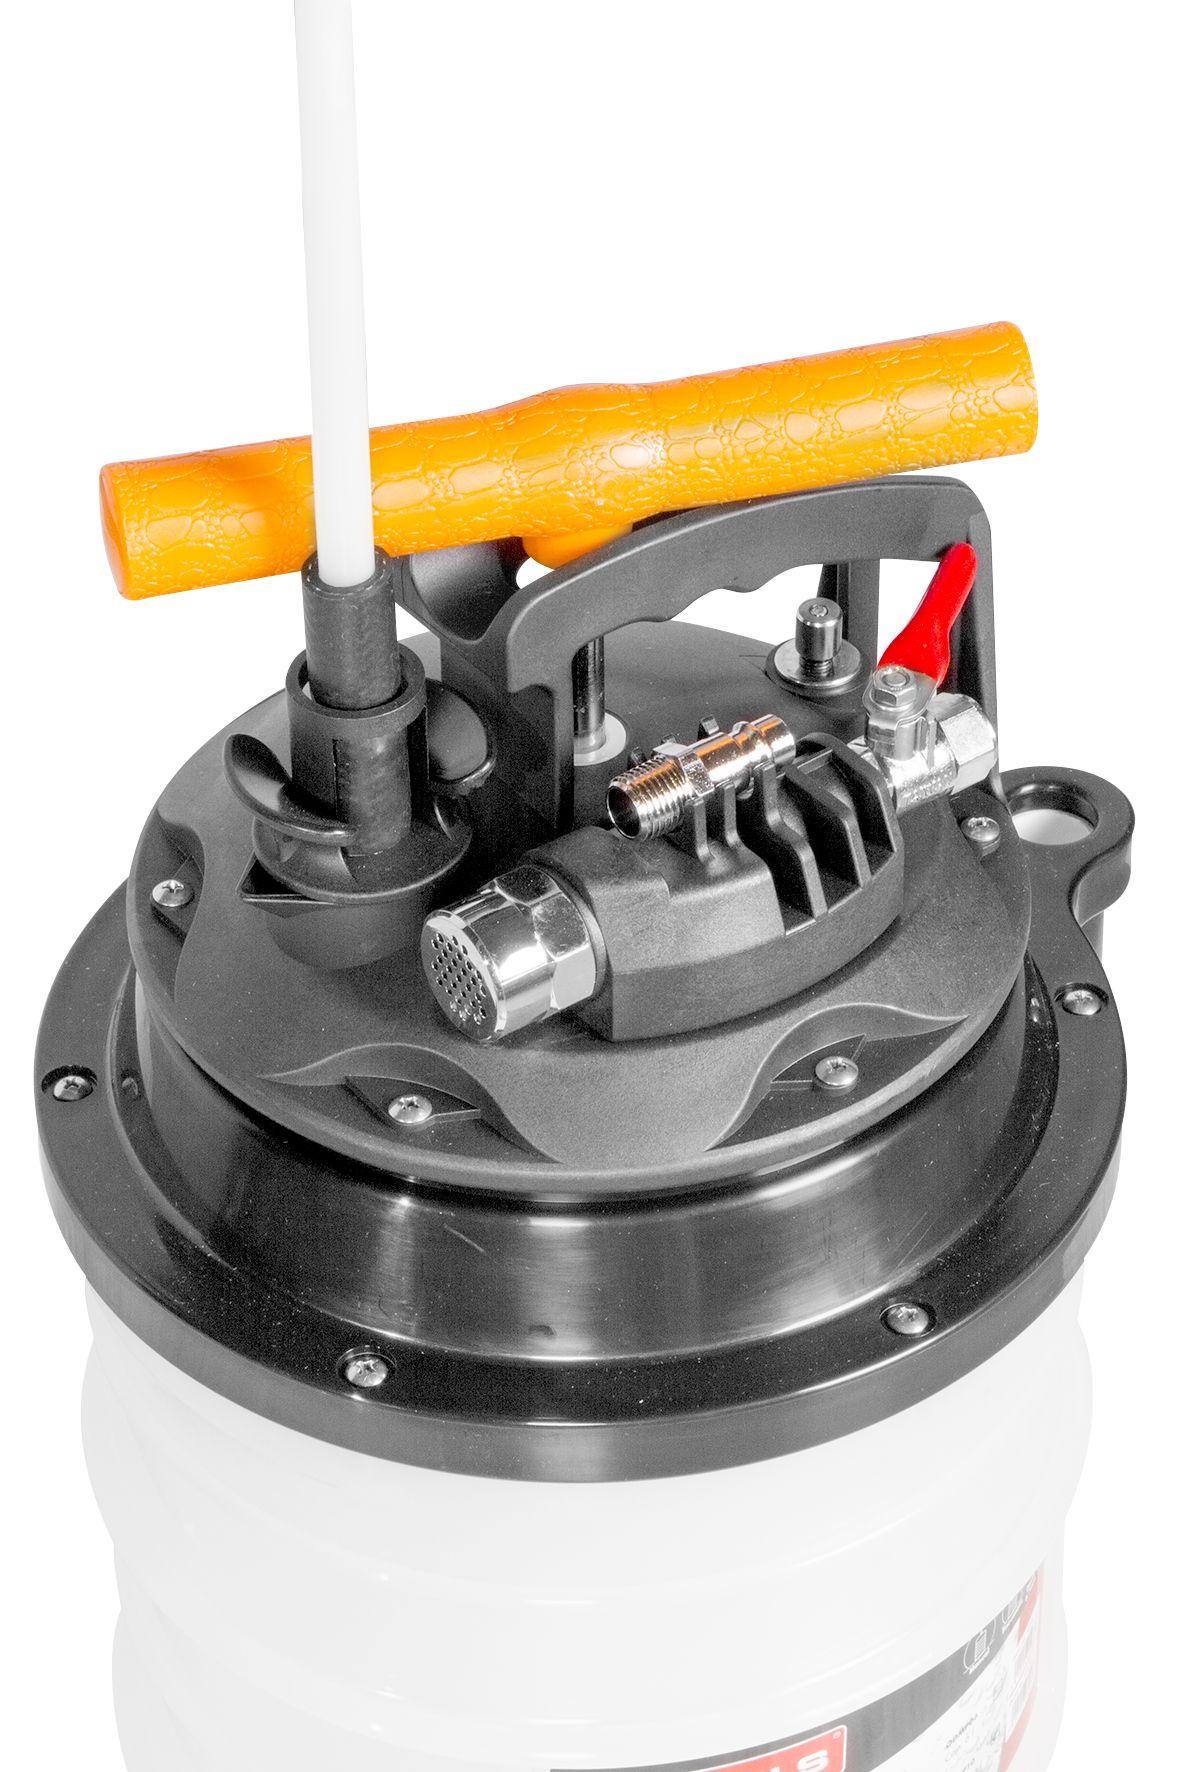 ODMP10 | fluid pumps | Mechanical workshop equipment | Vynckier tools